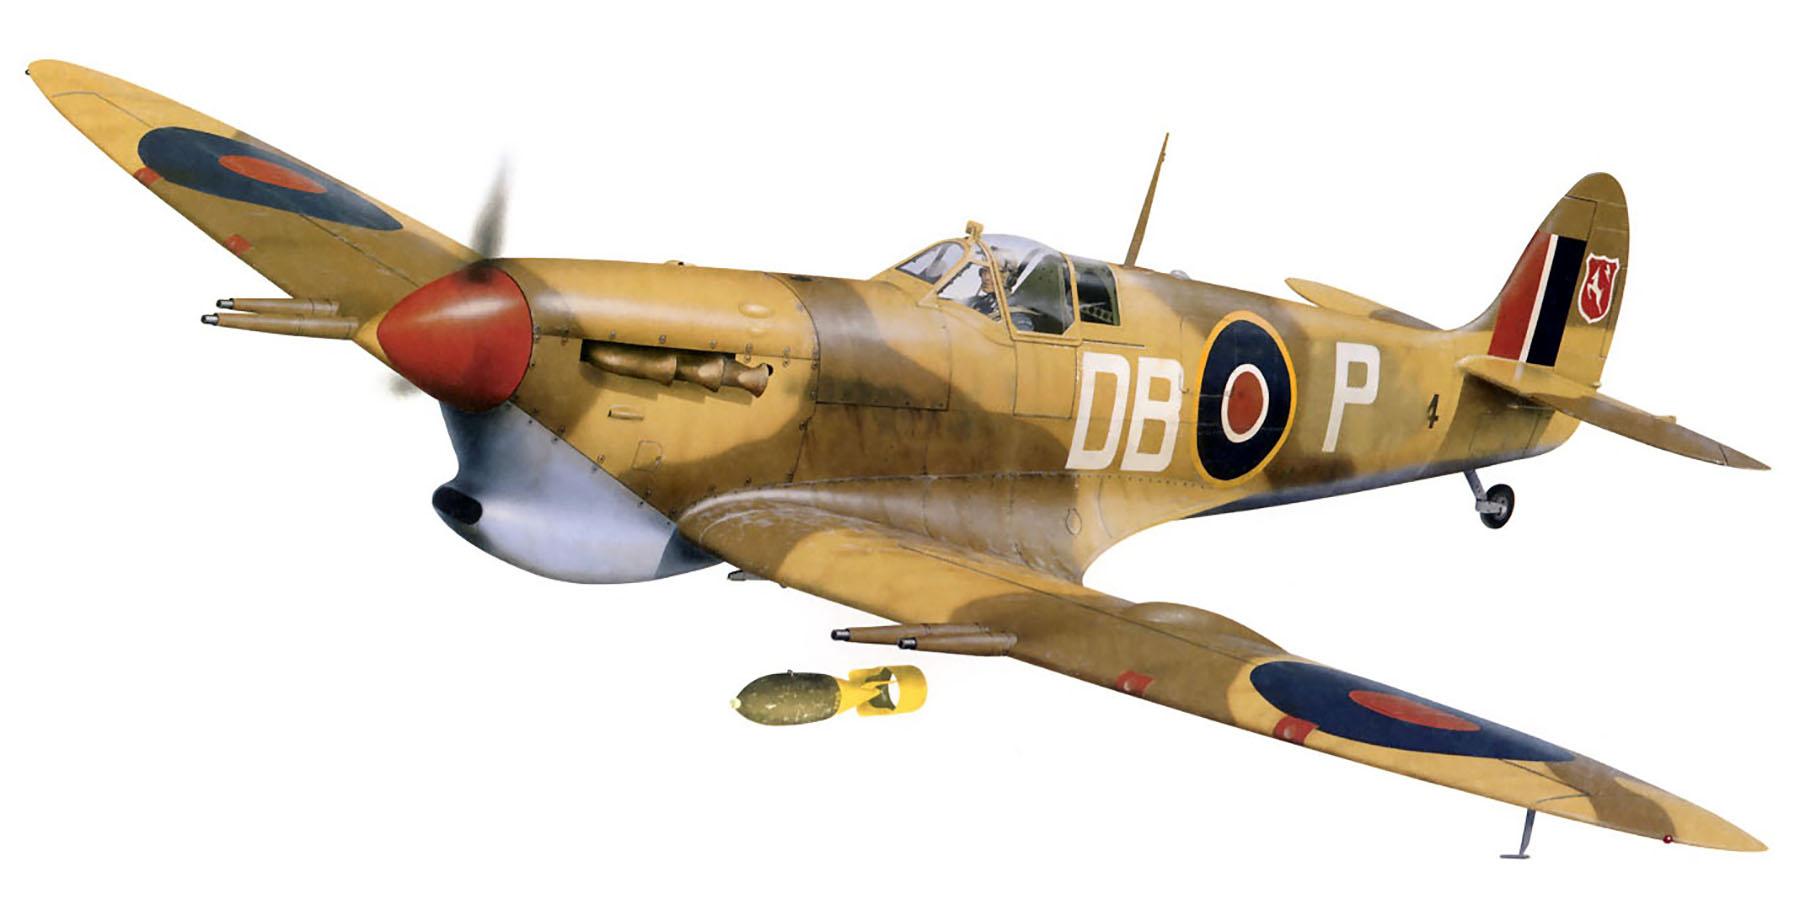 Spitfire MkVcTrop SAAF 2Sqn DBP Sicily Italy 1943 0A